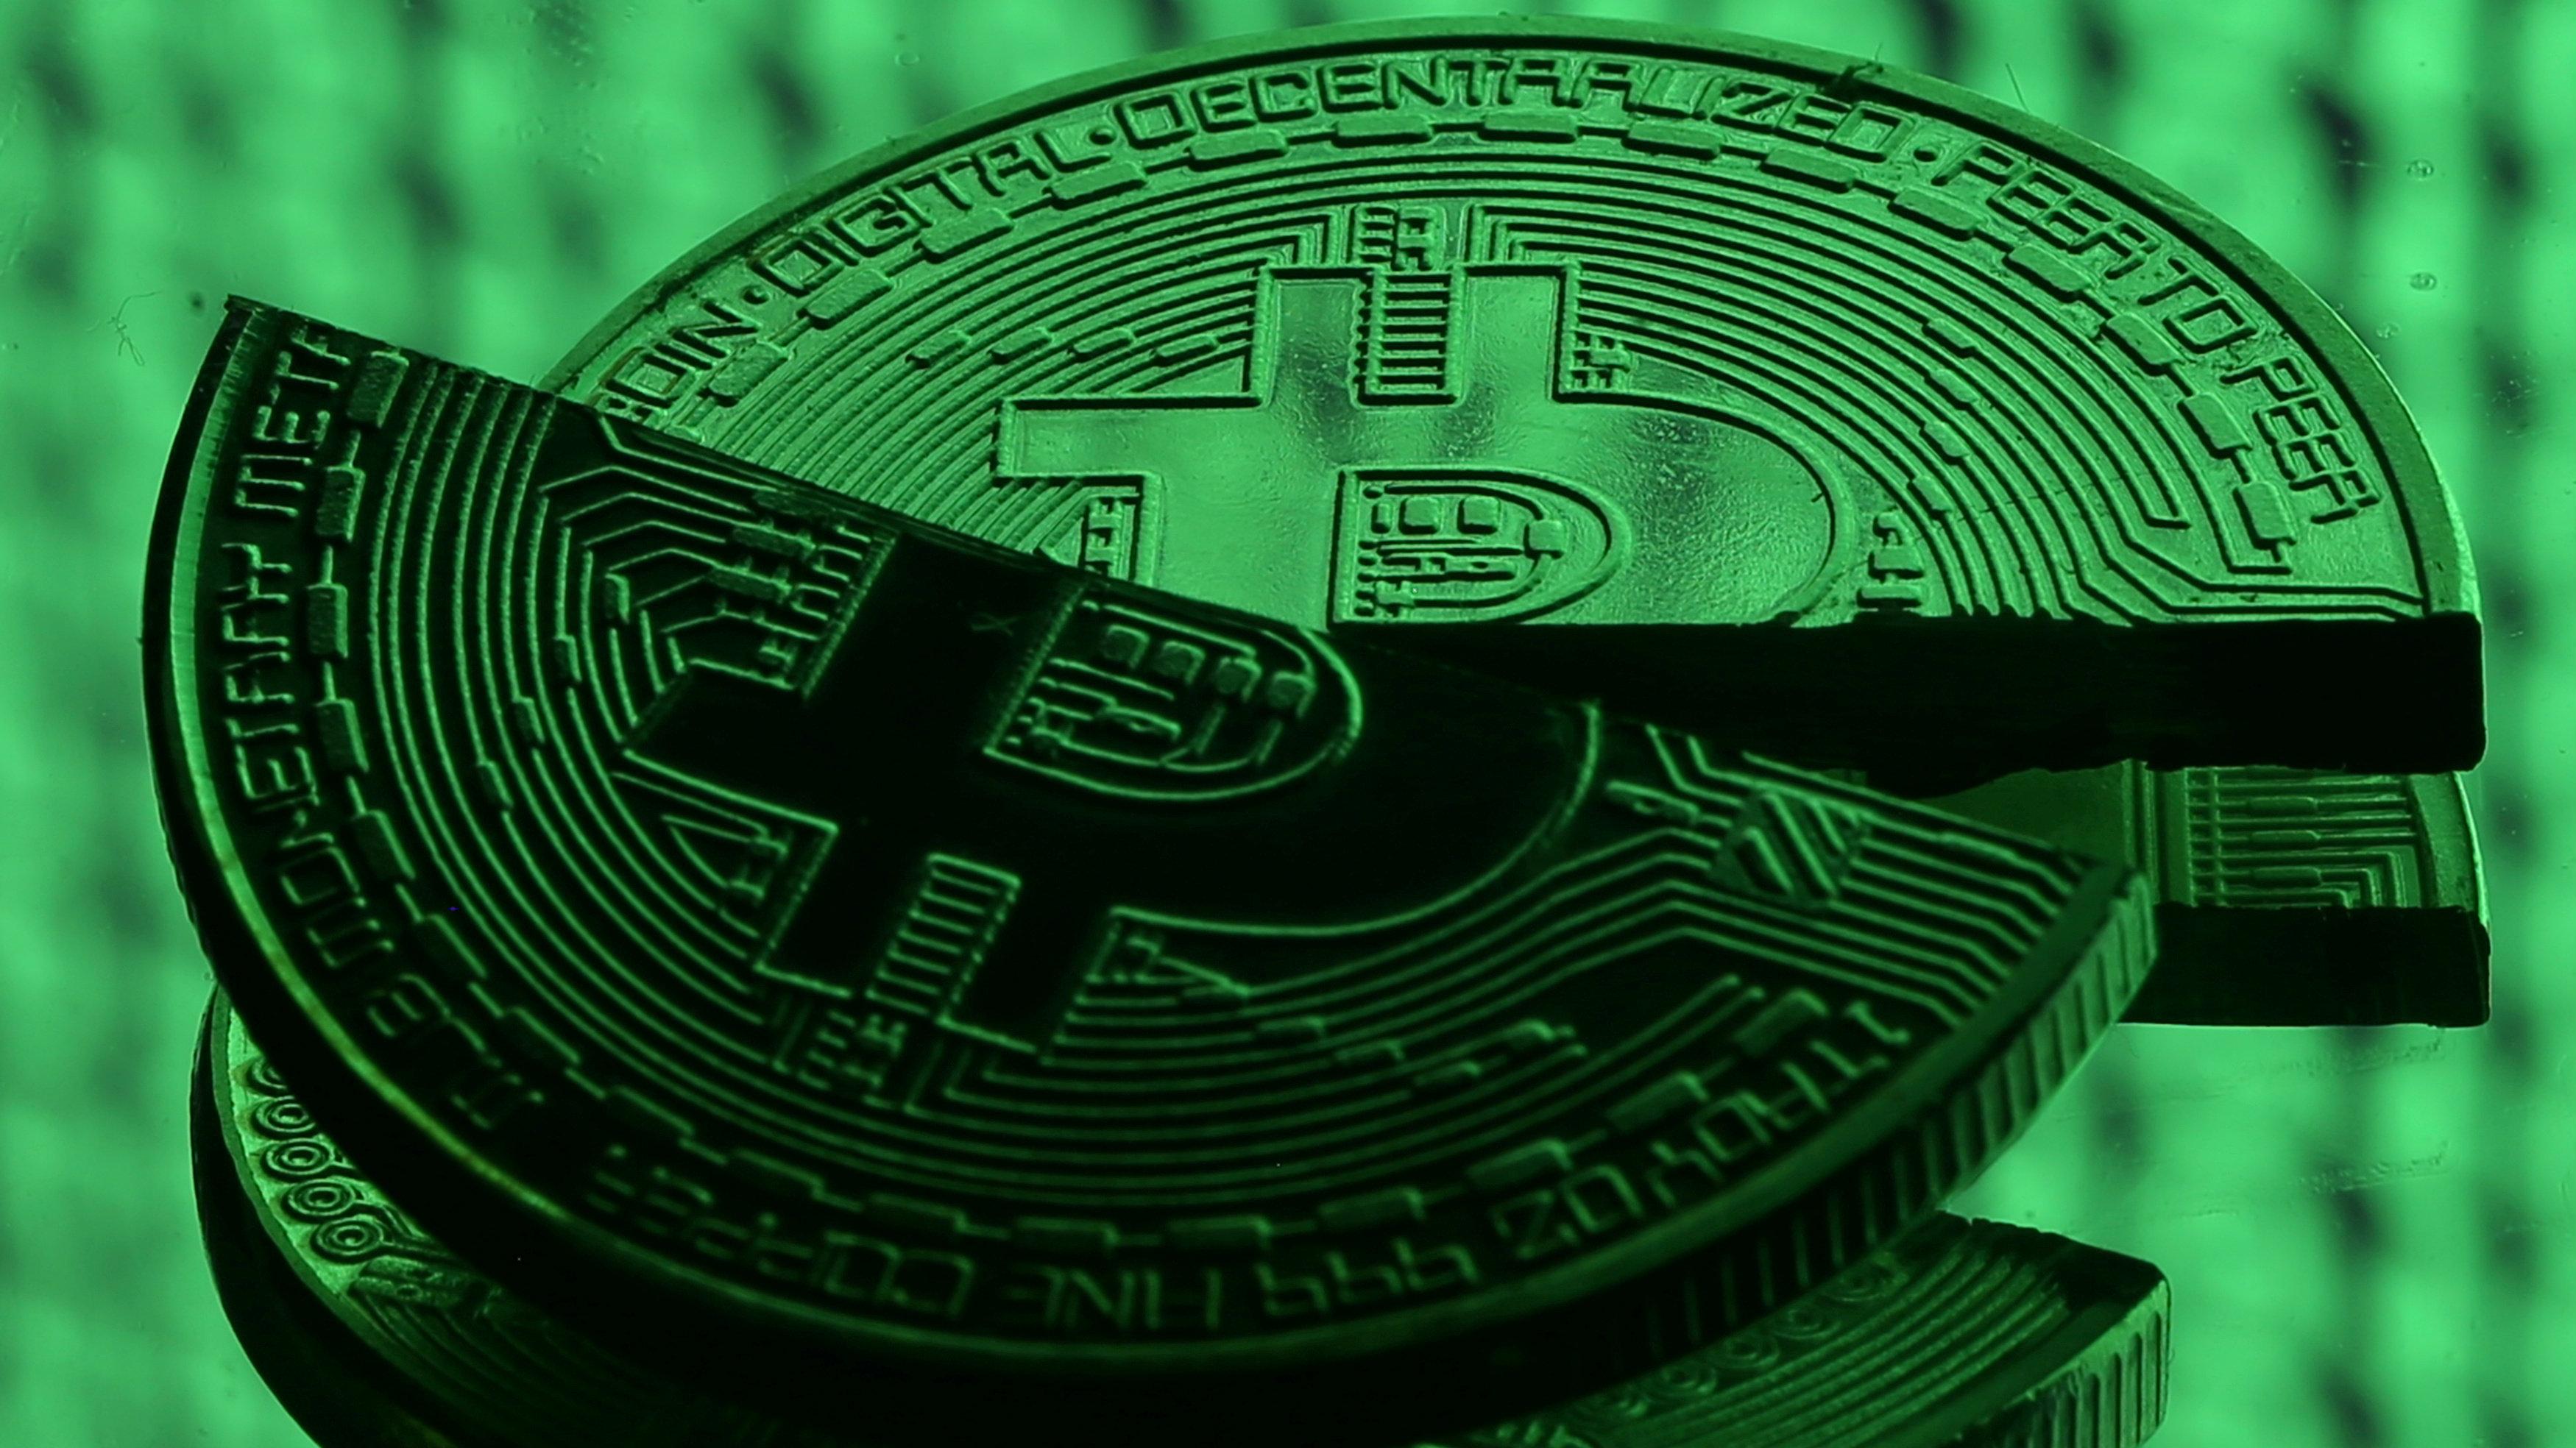 Broken representations of the Bitcoin virtual currency.